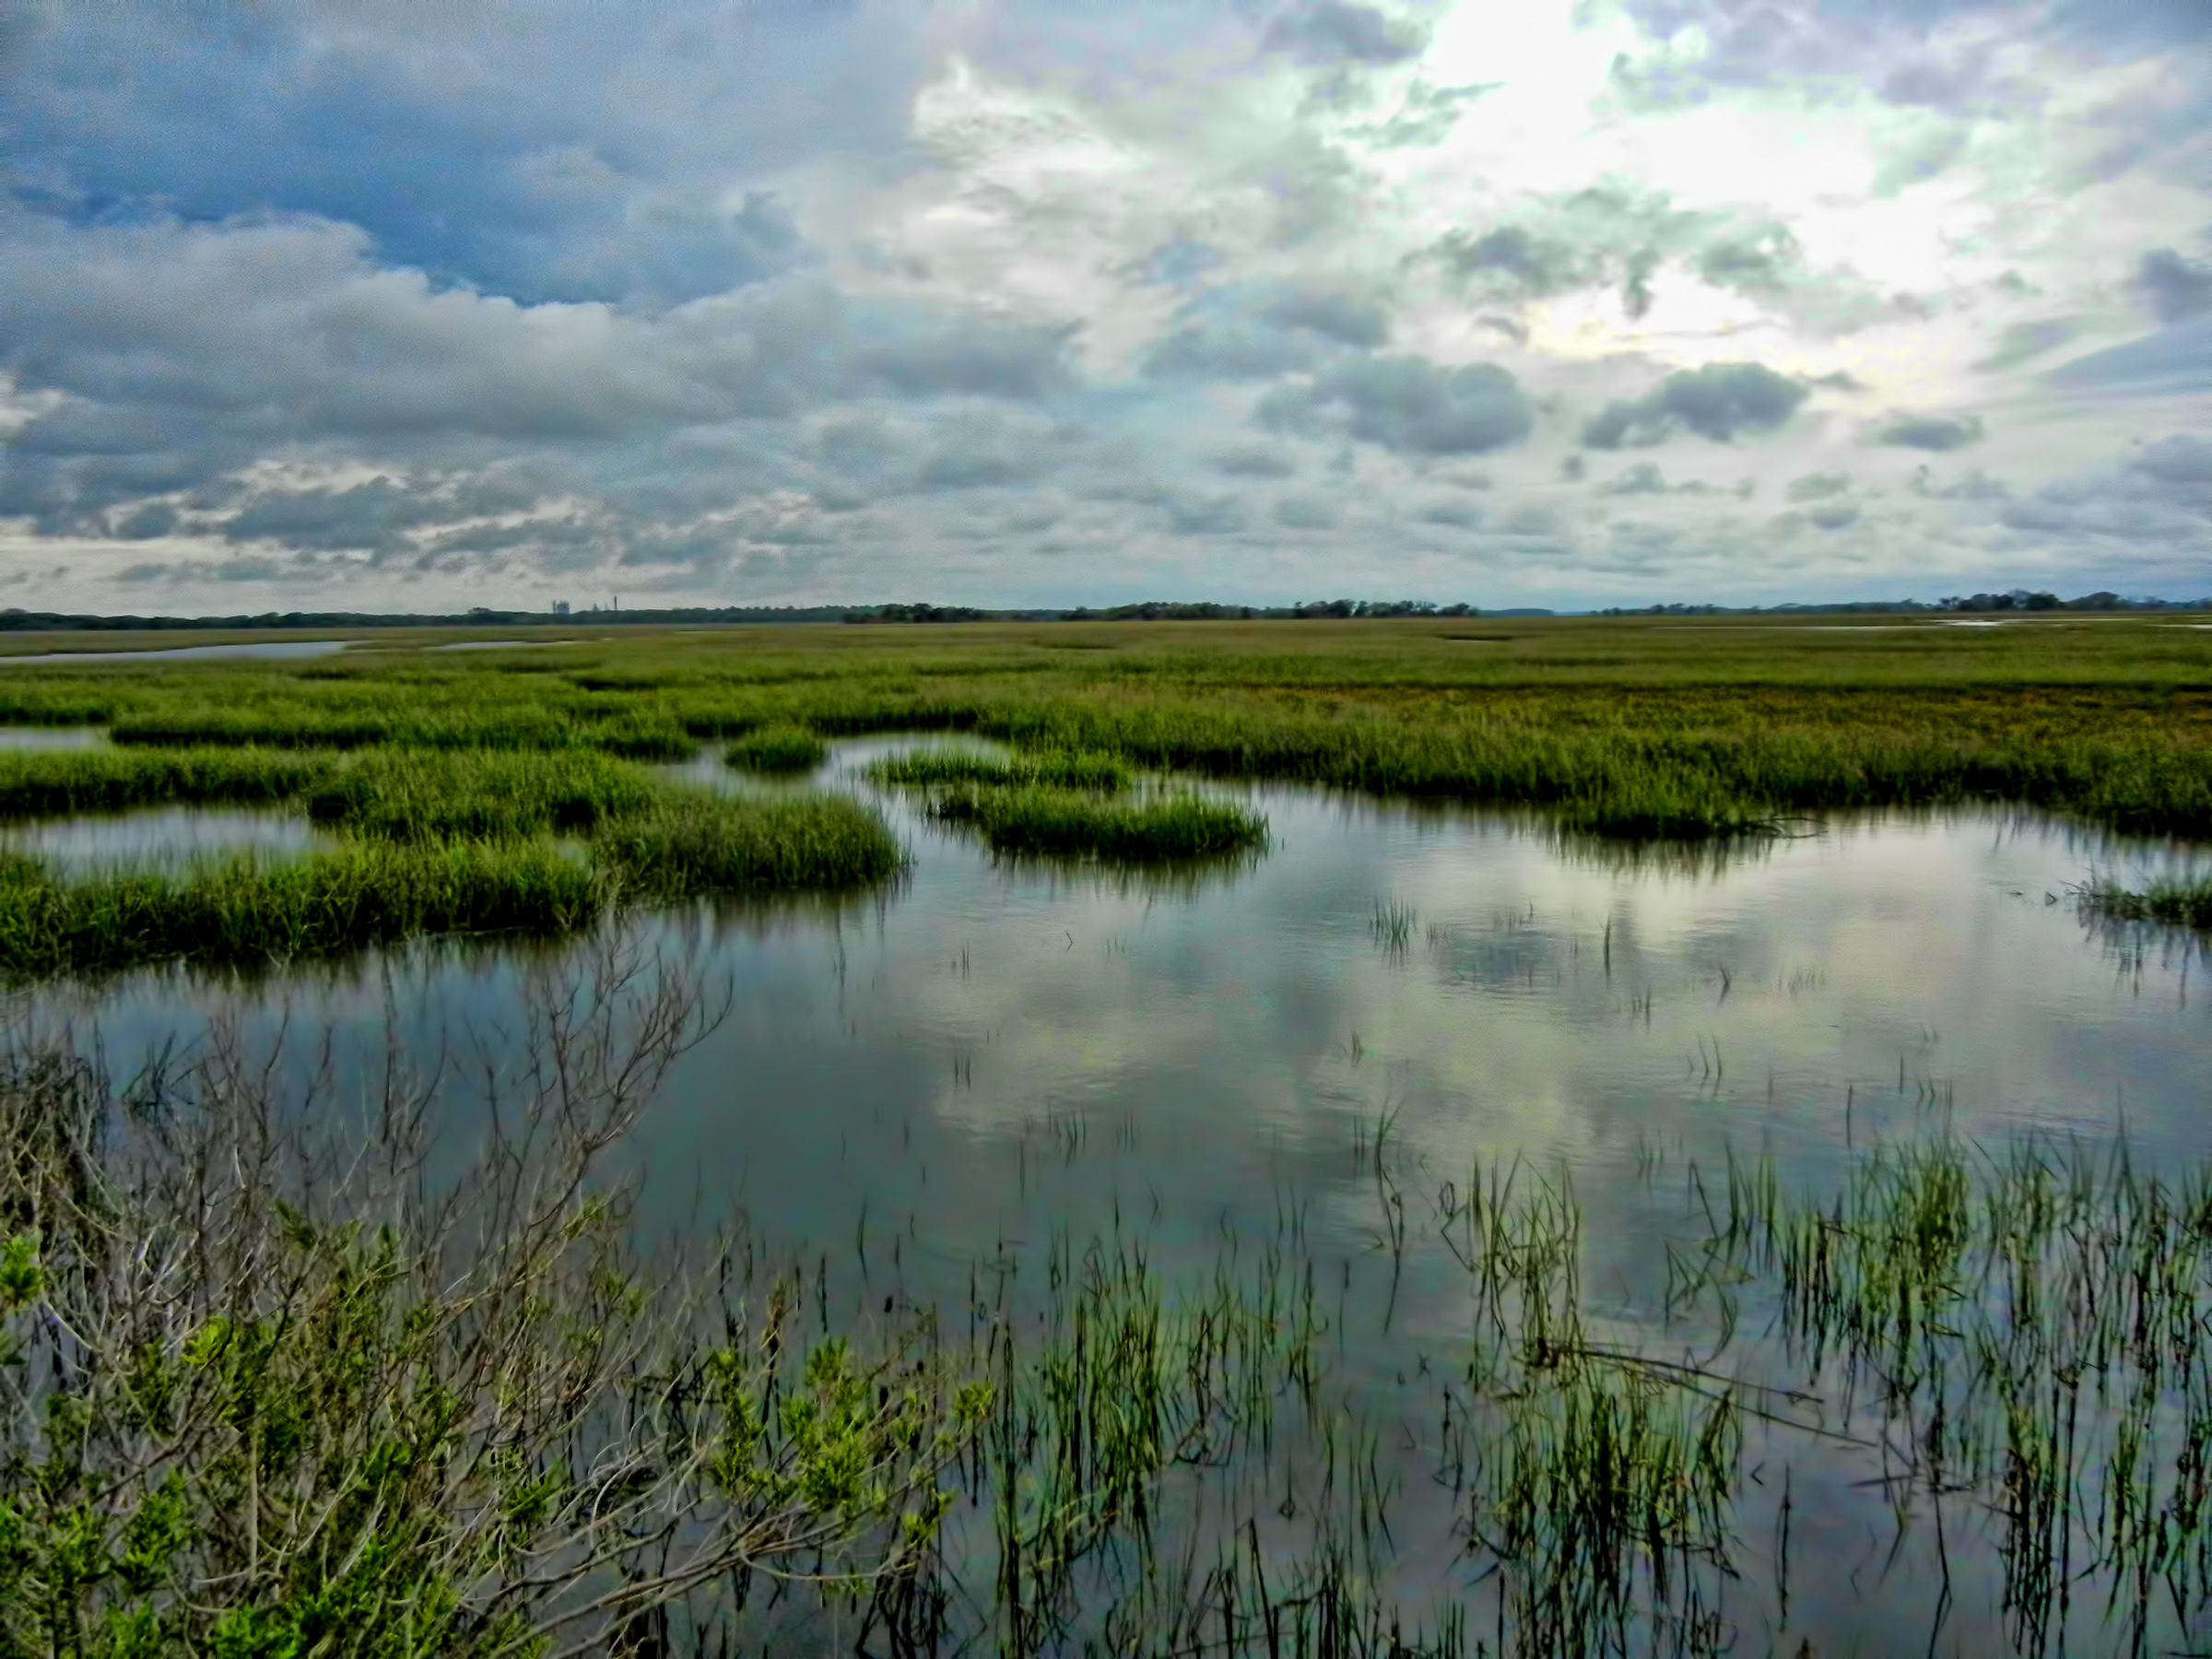 File:Salt marsh Georgia US.jpg - Wikimedia Commons